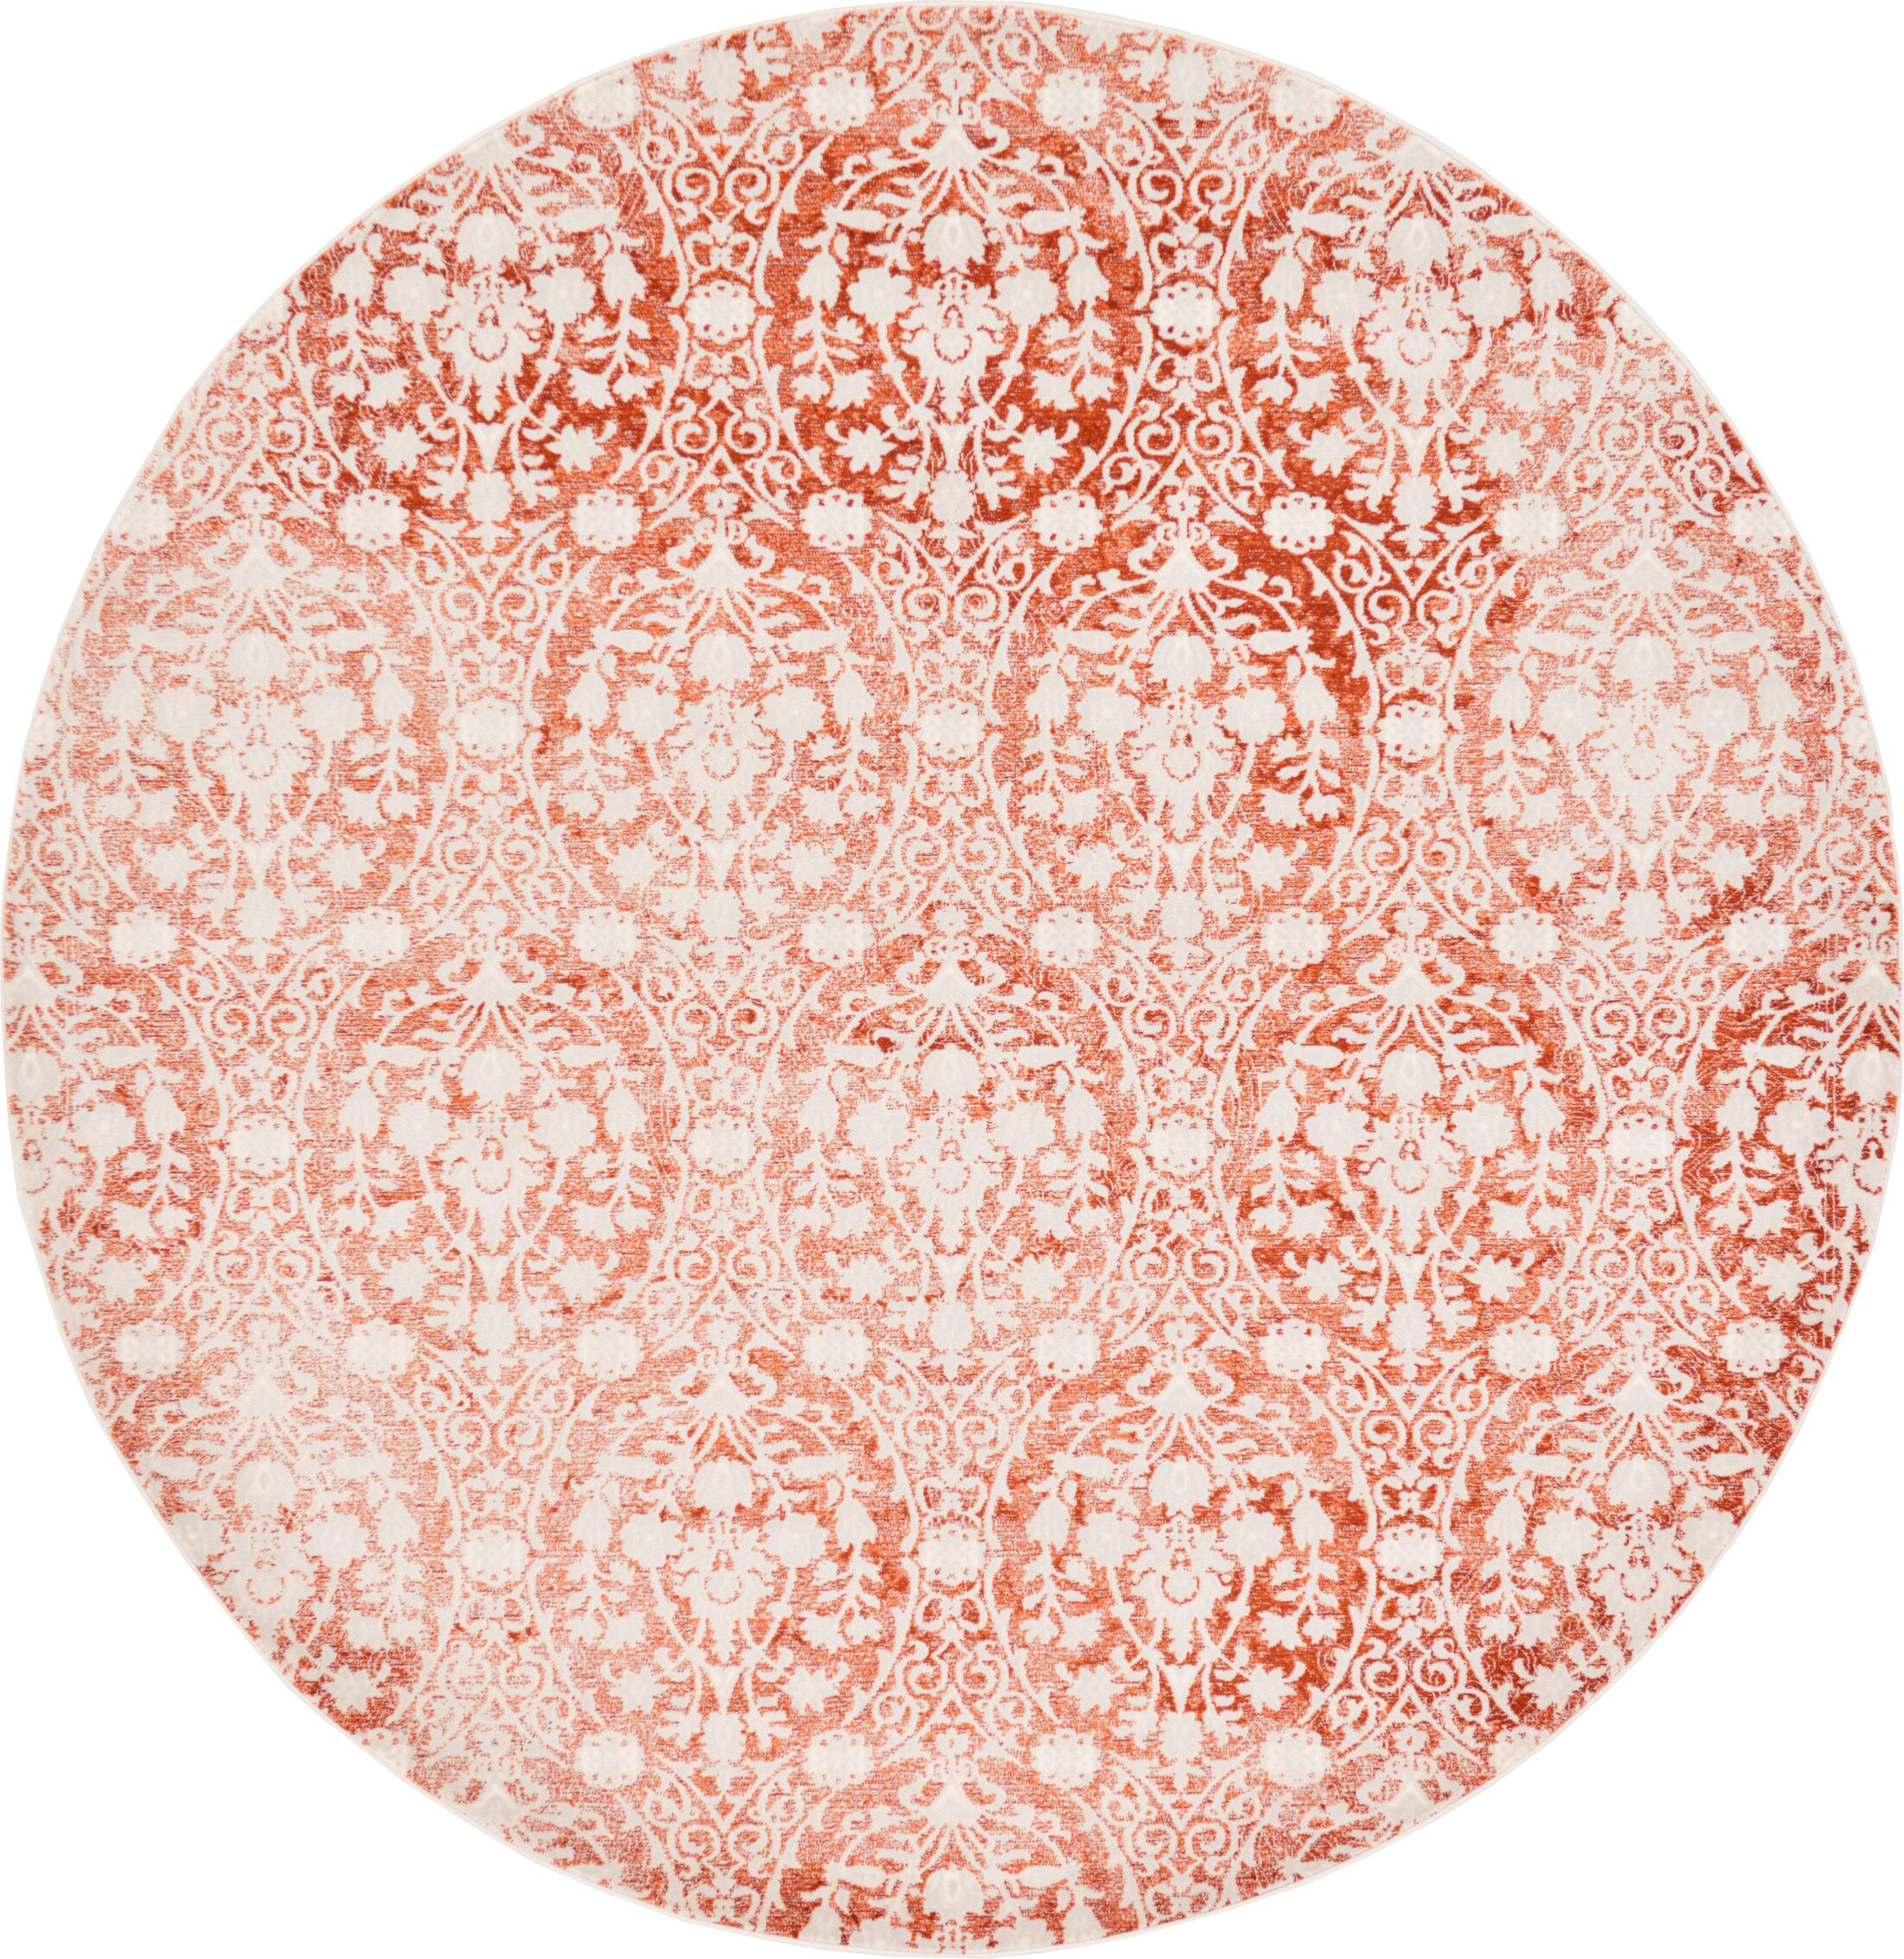 Patenaude Terracotta Area Rug Rug Size: Round 8'